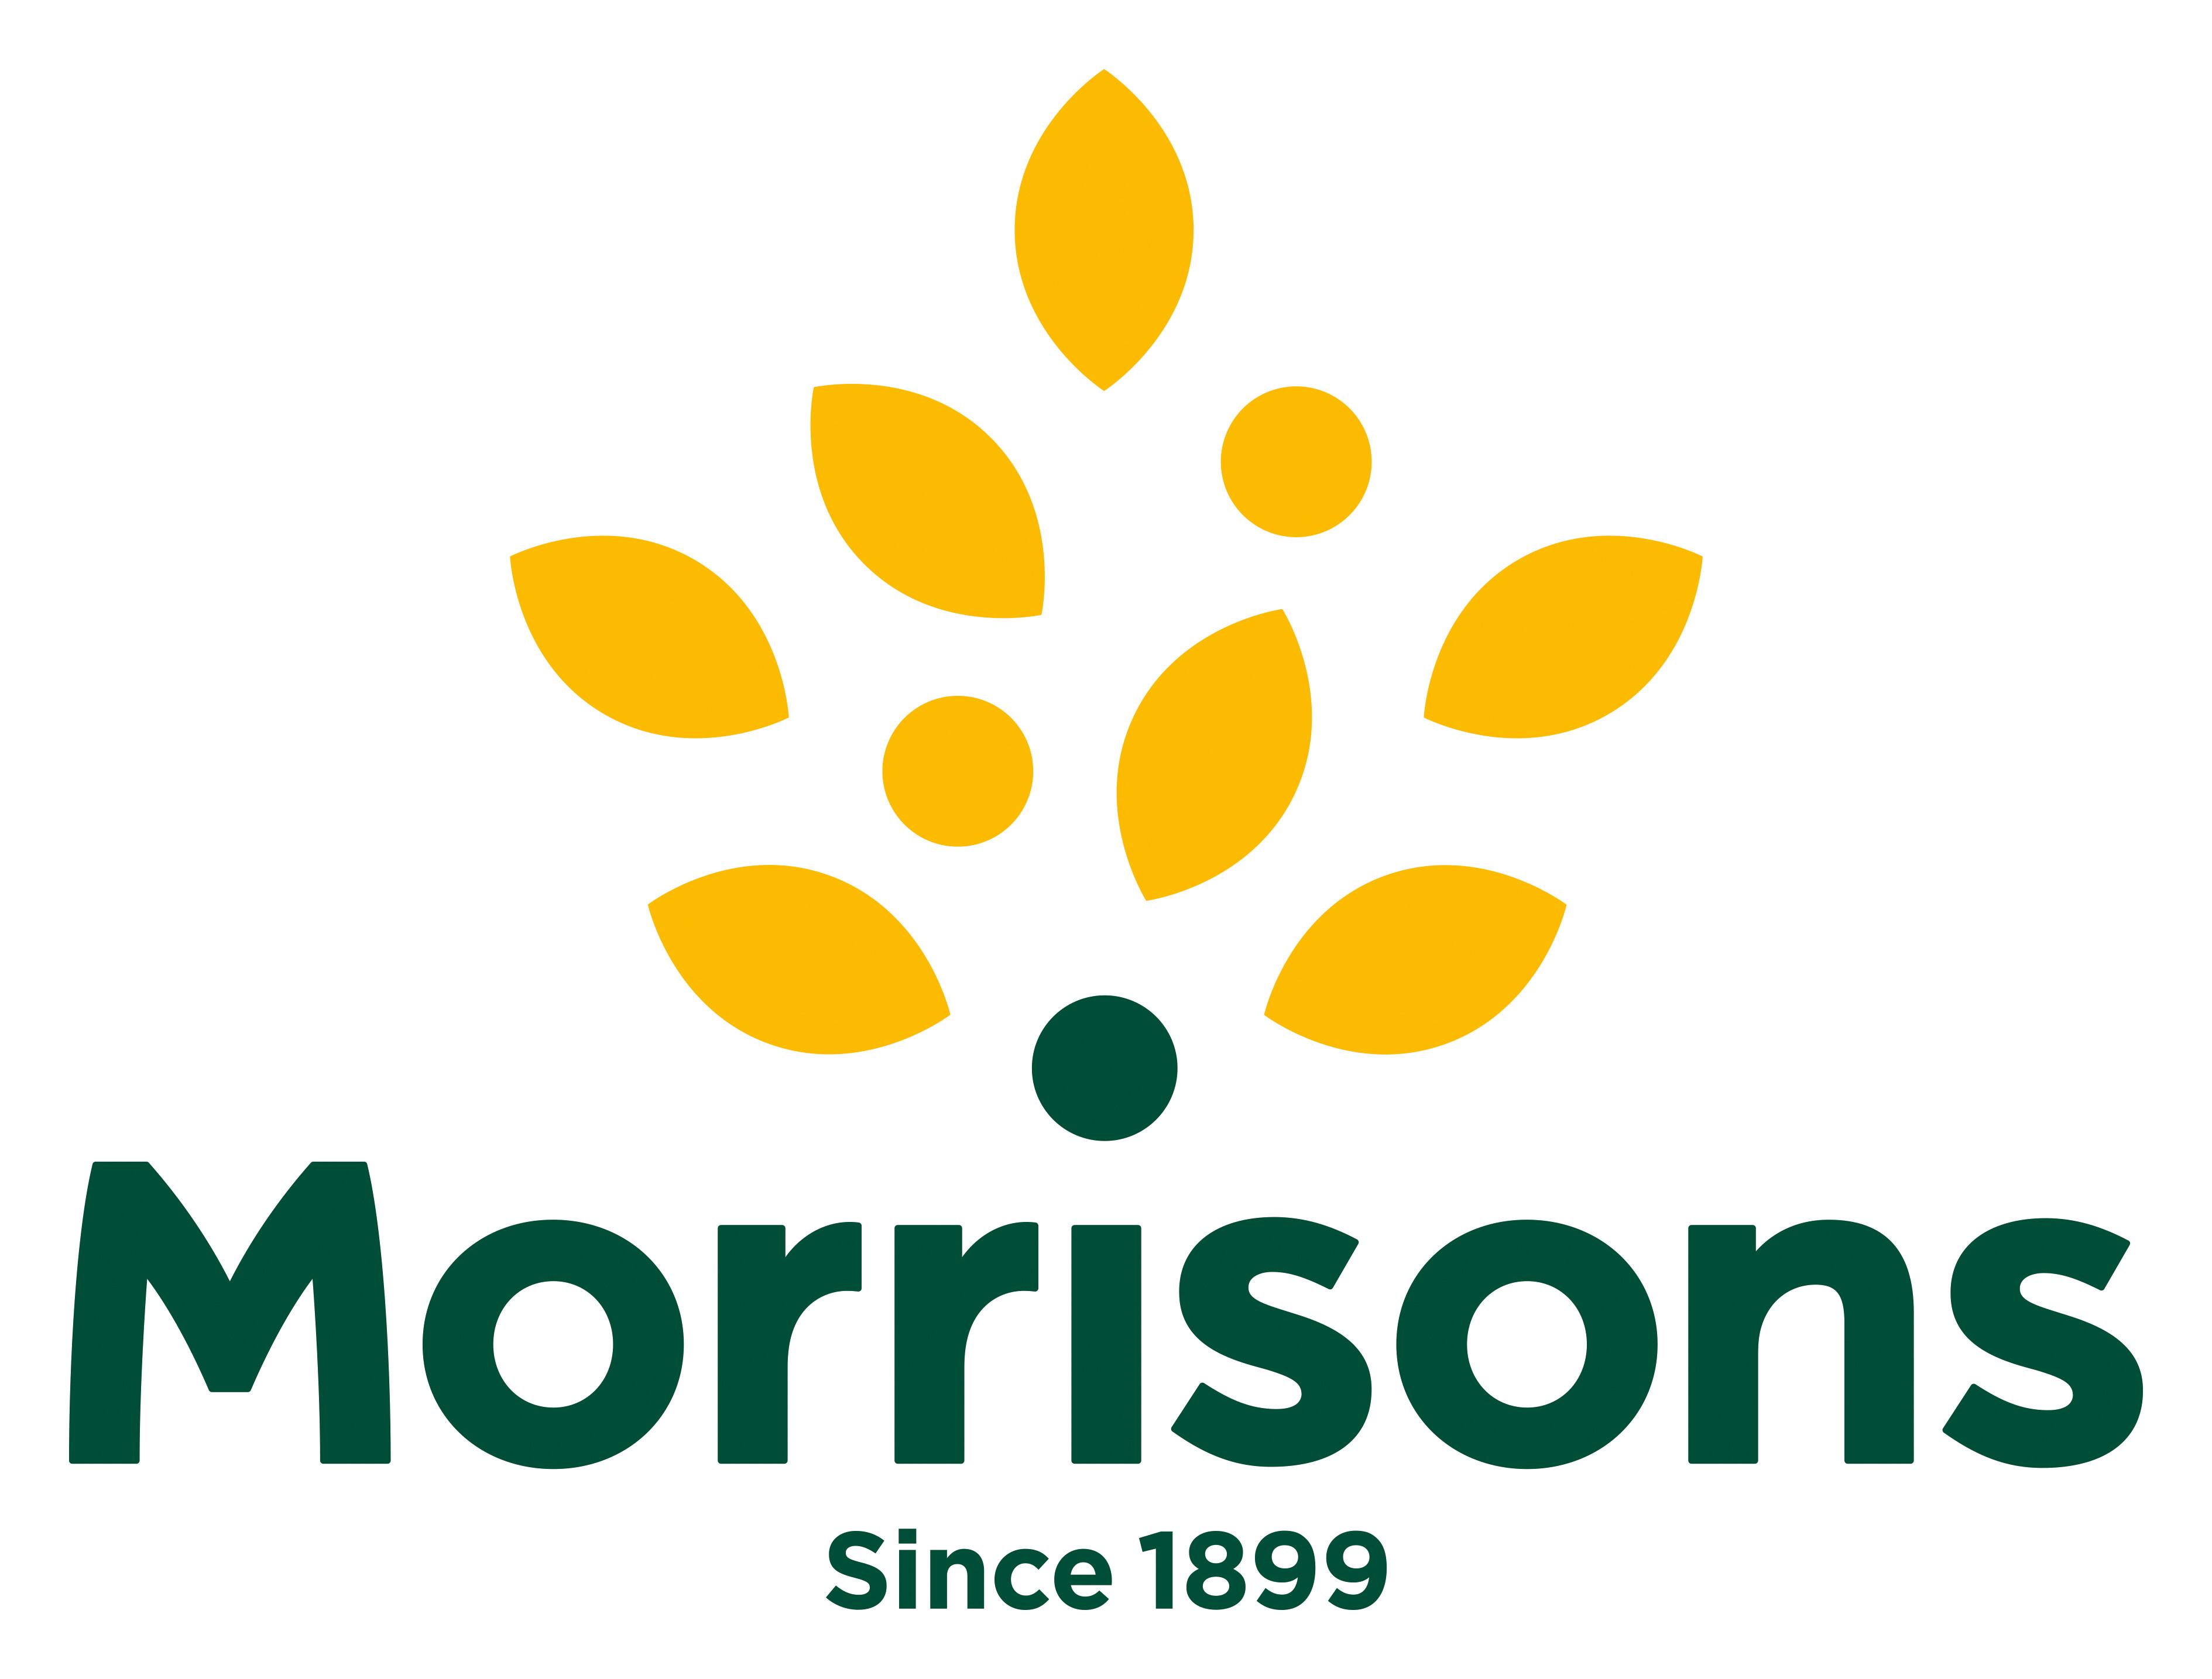 My Morrisons Logo